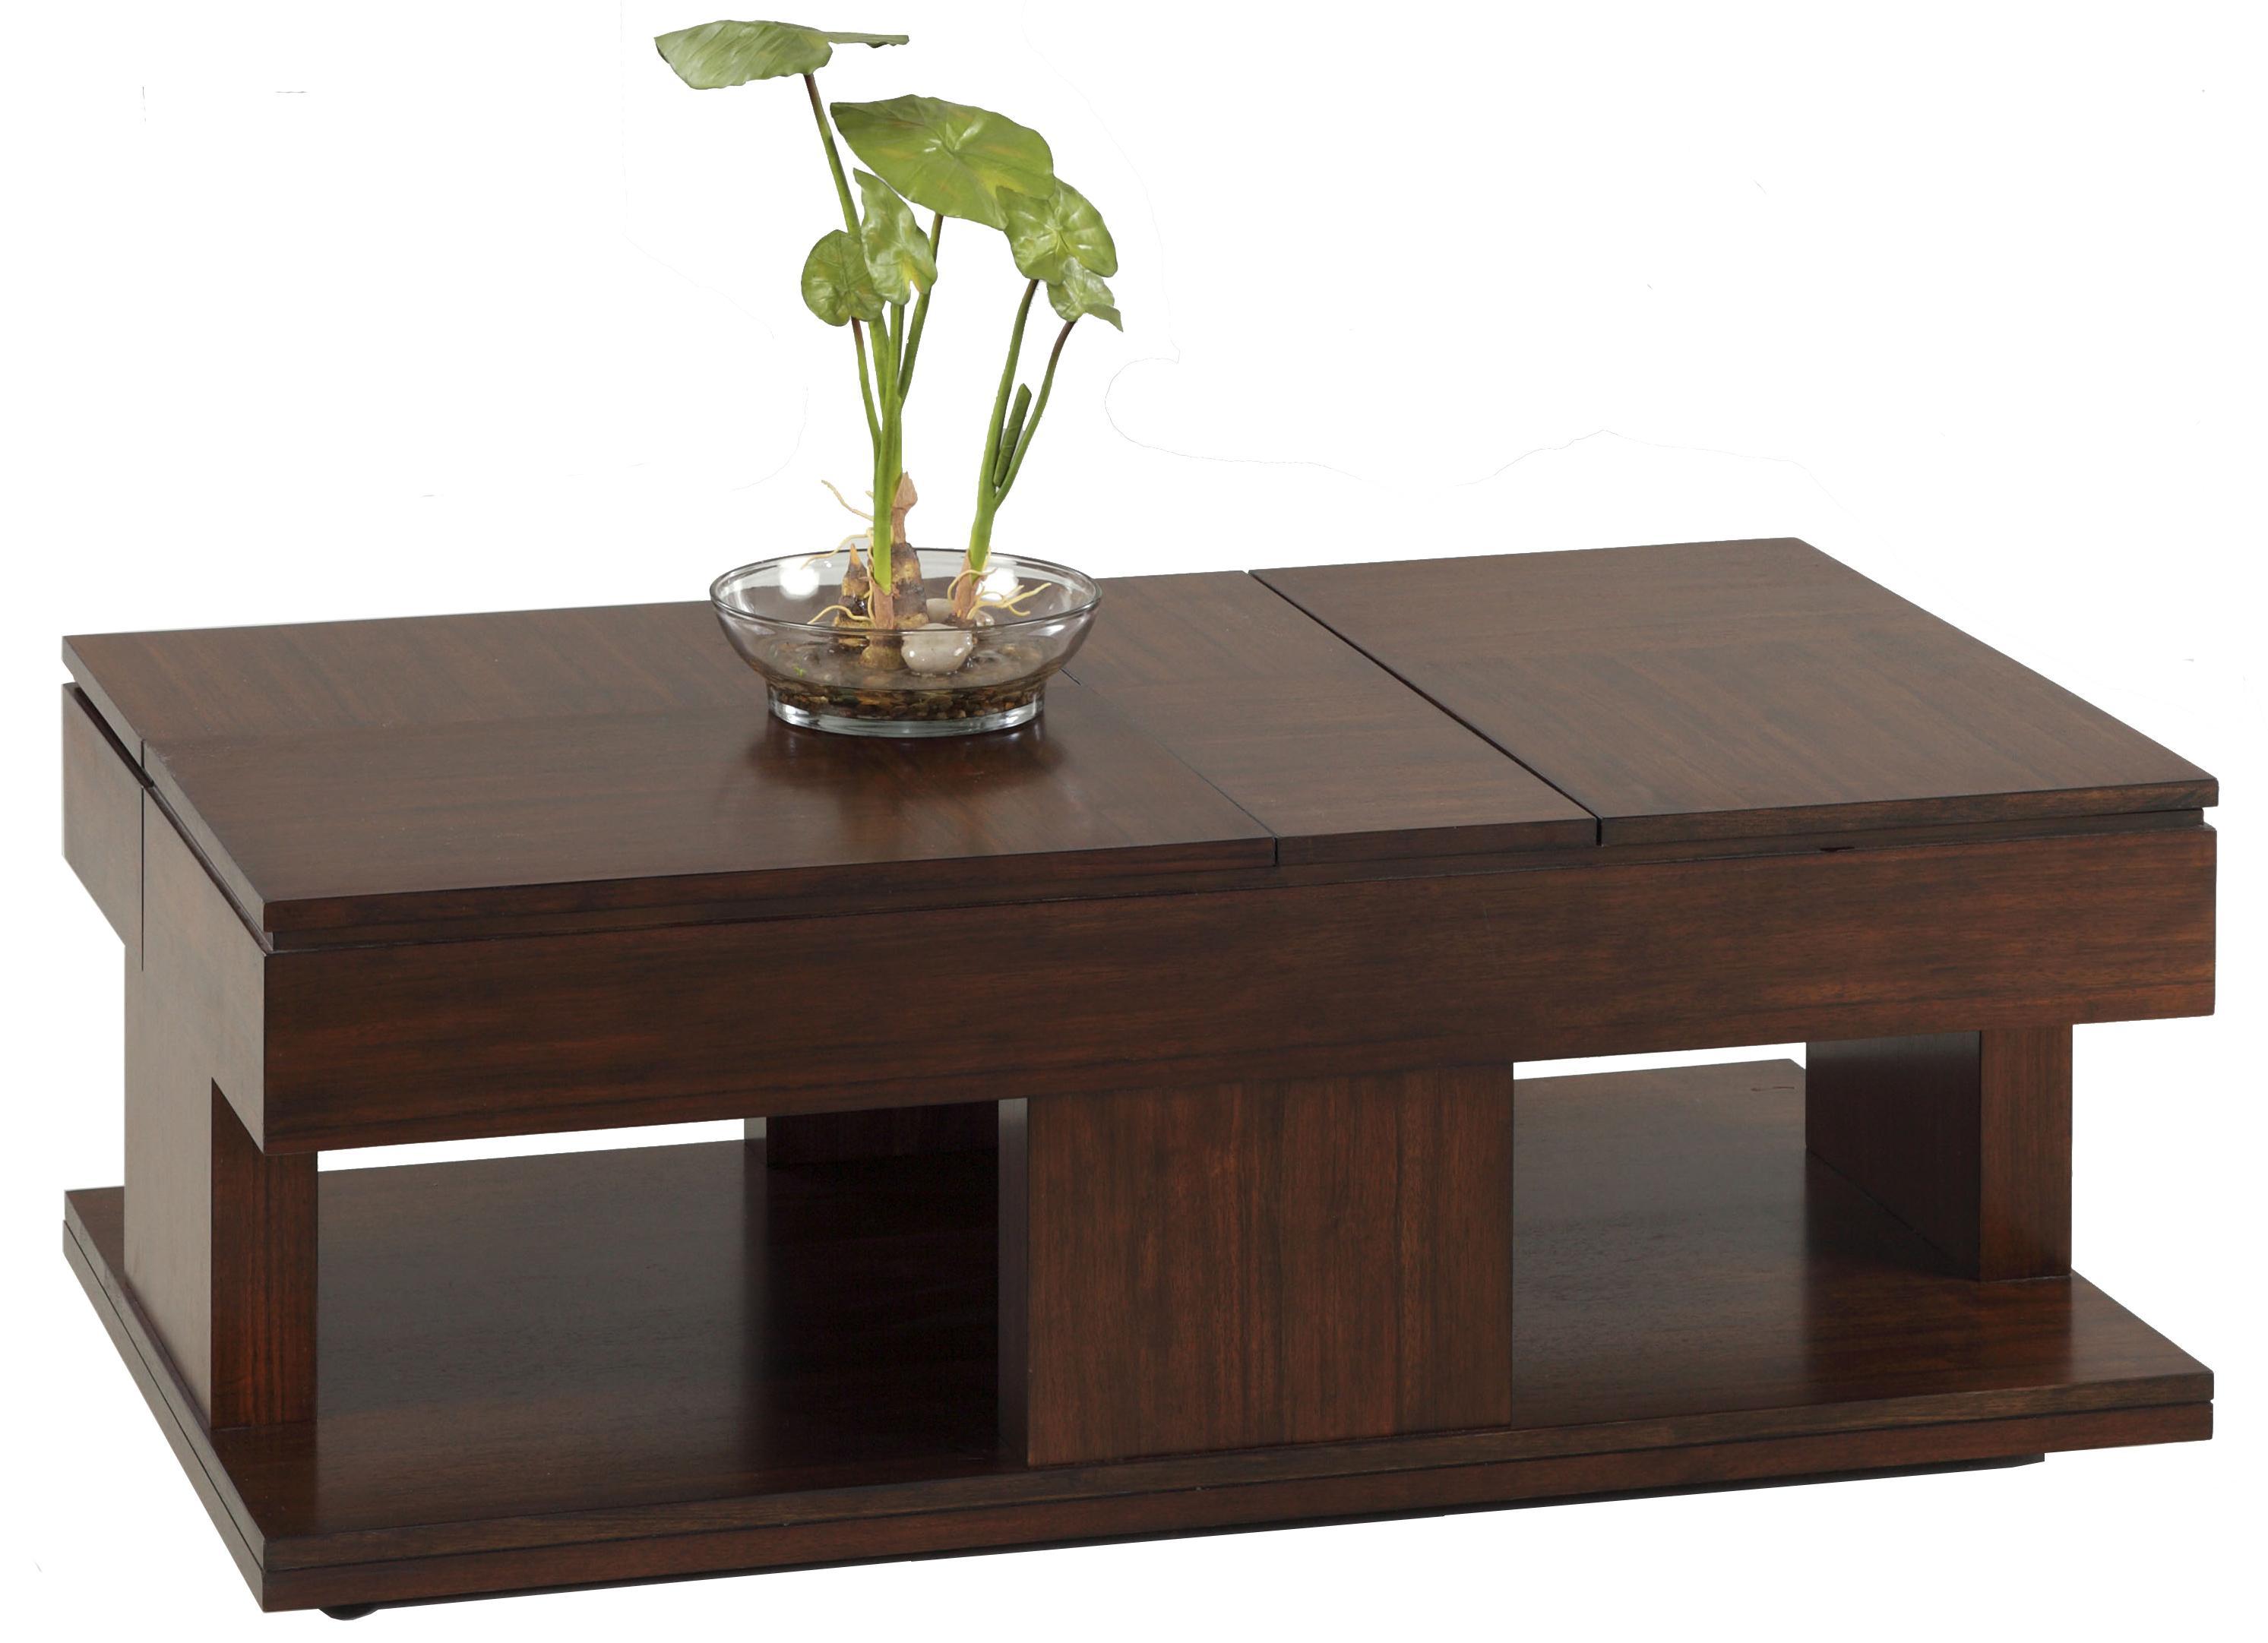 Progressive Furniture Le Mans Double Lift Top Cocktail Table - Item Number: P561-25